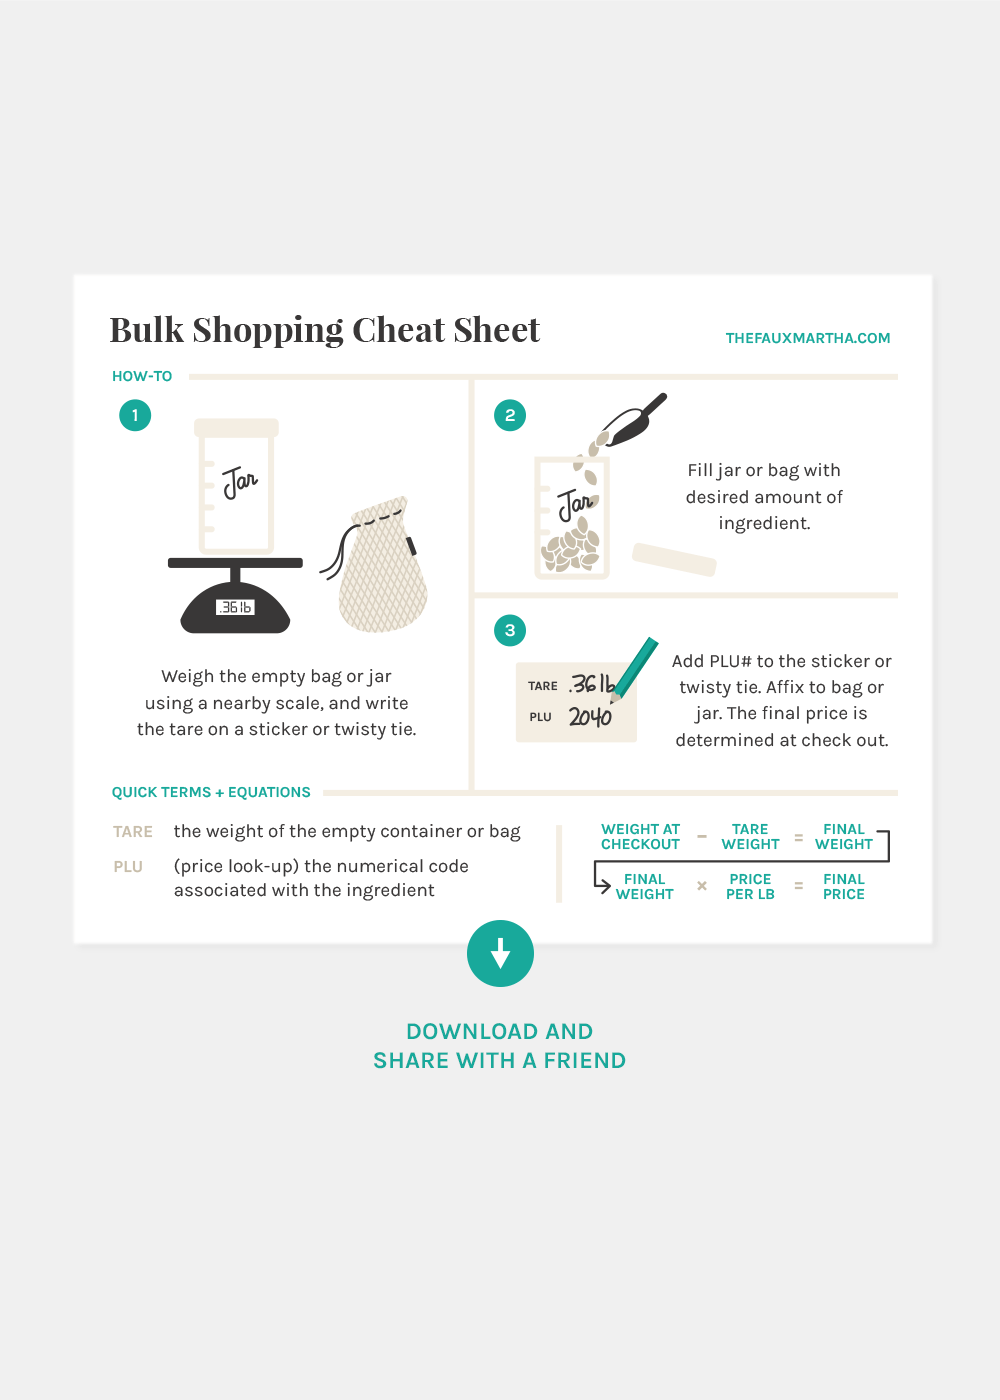 Bulk Shopping Cheat Sheet Printable from The Faux Martha